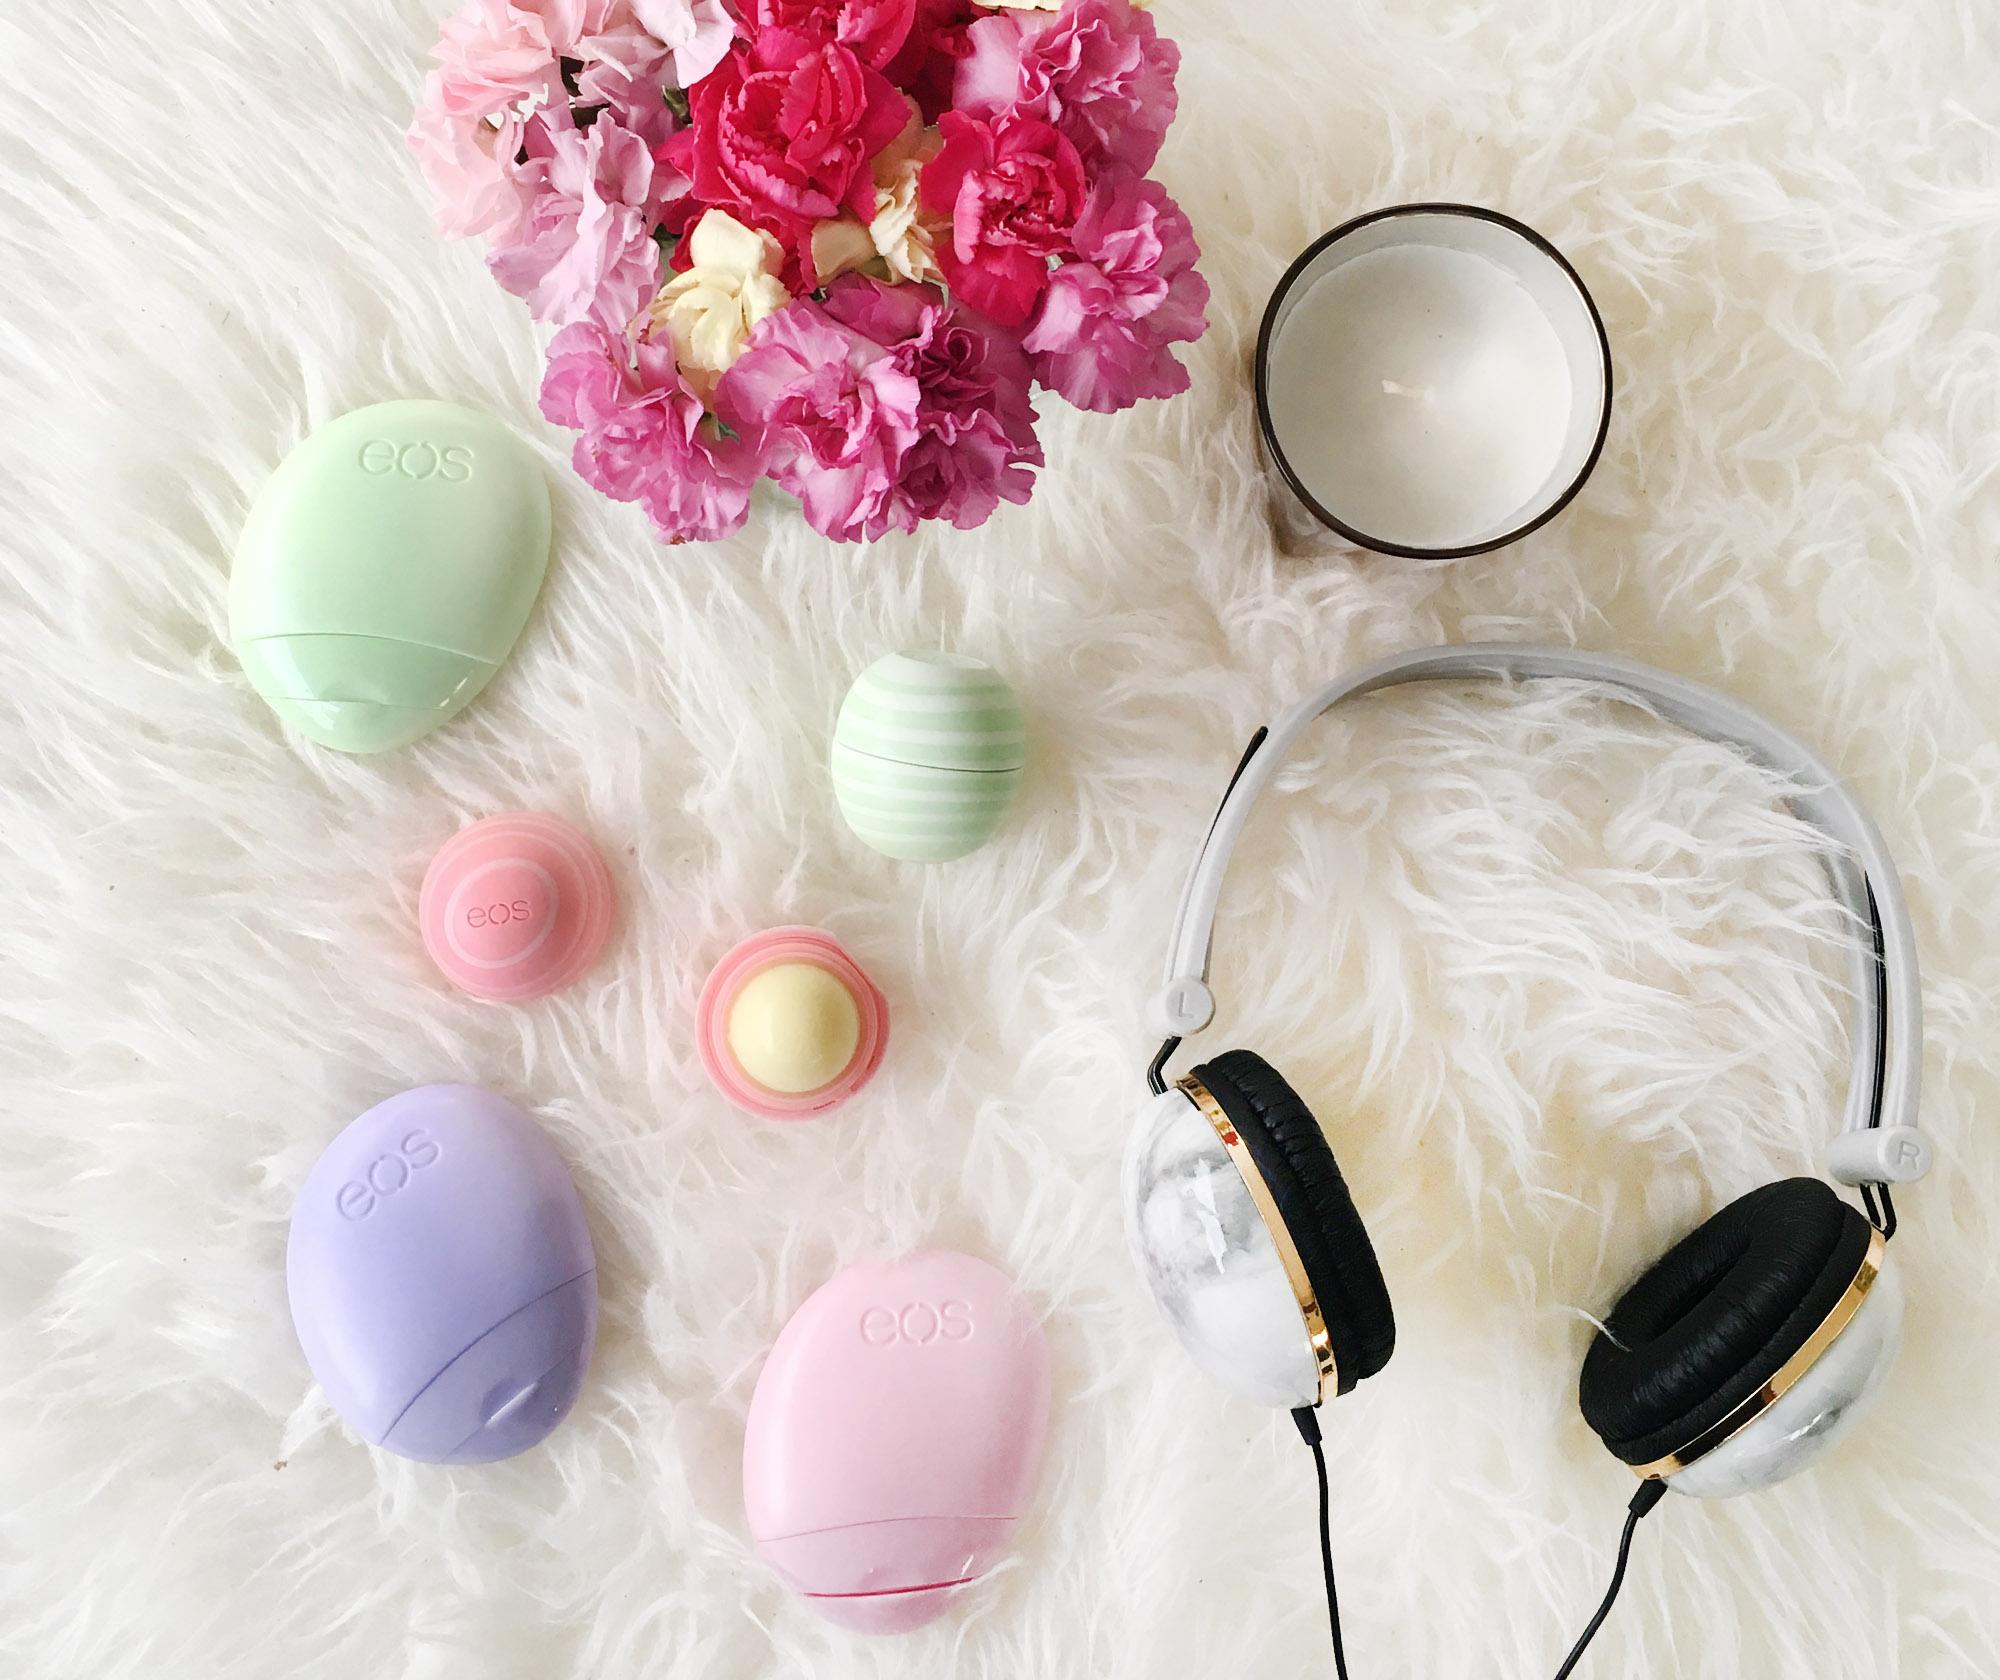 Spring Essentials EOS Gift Pack